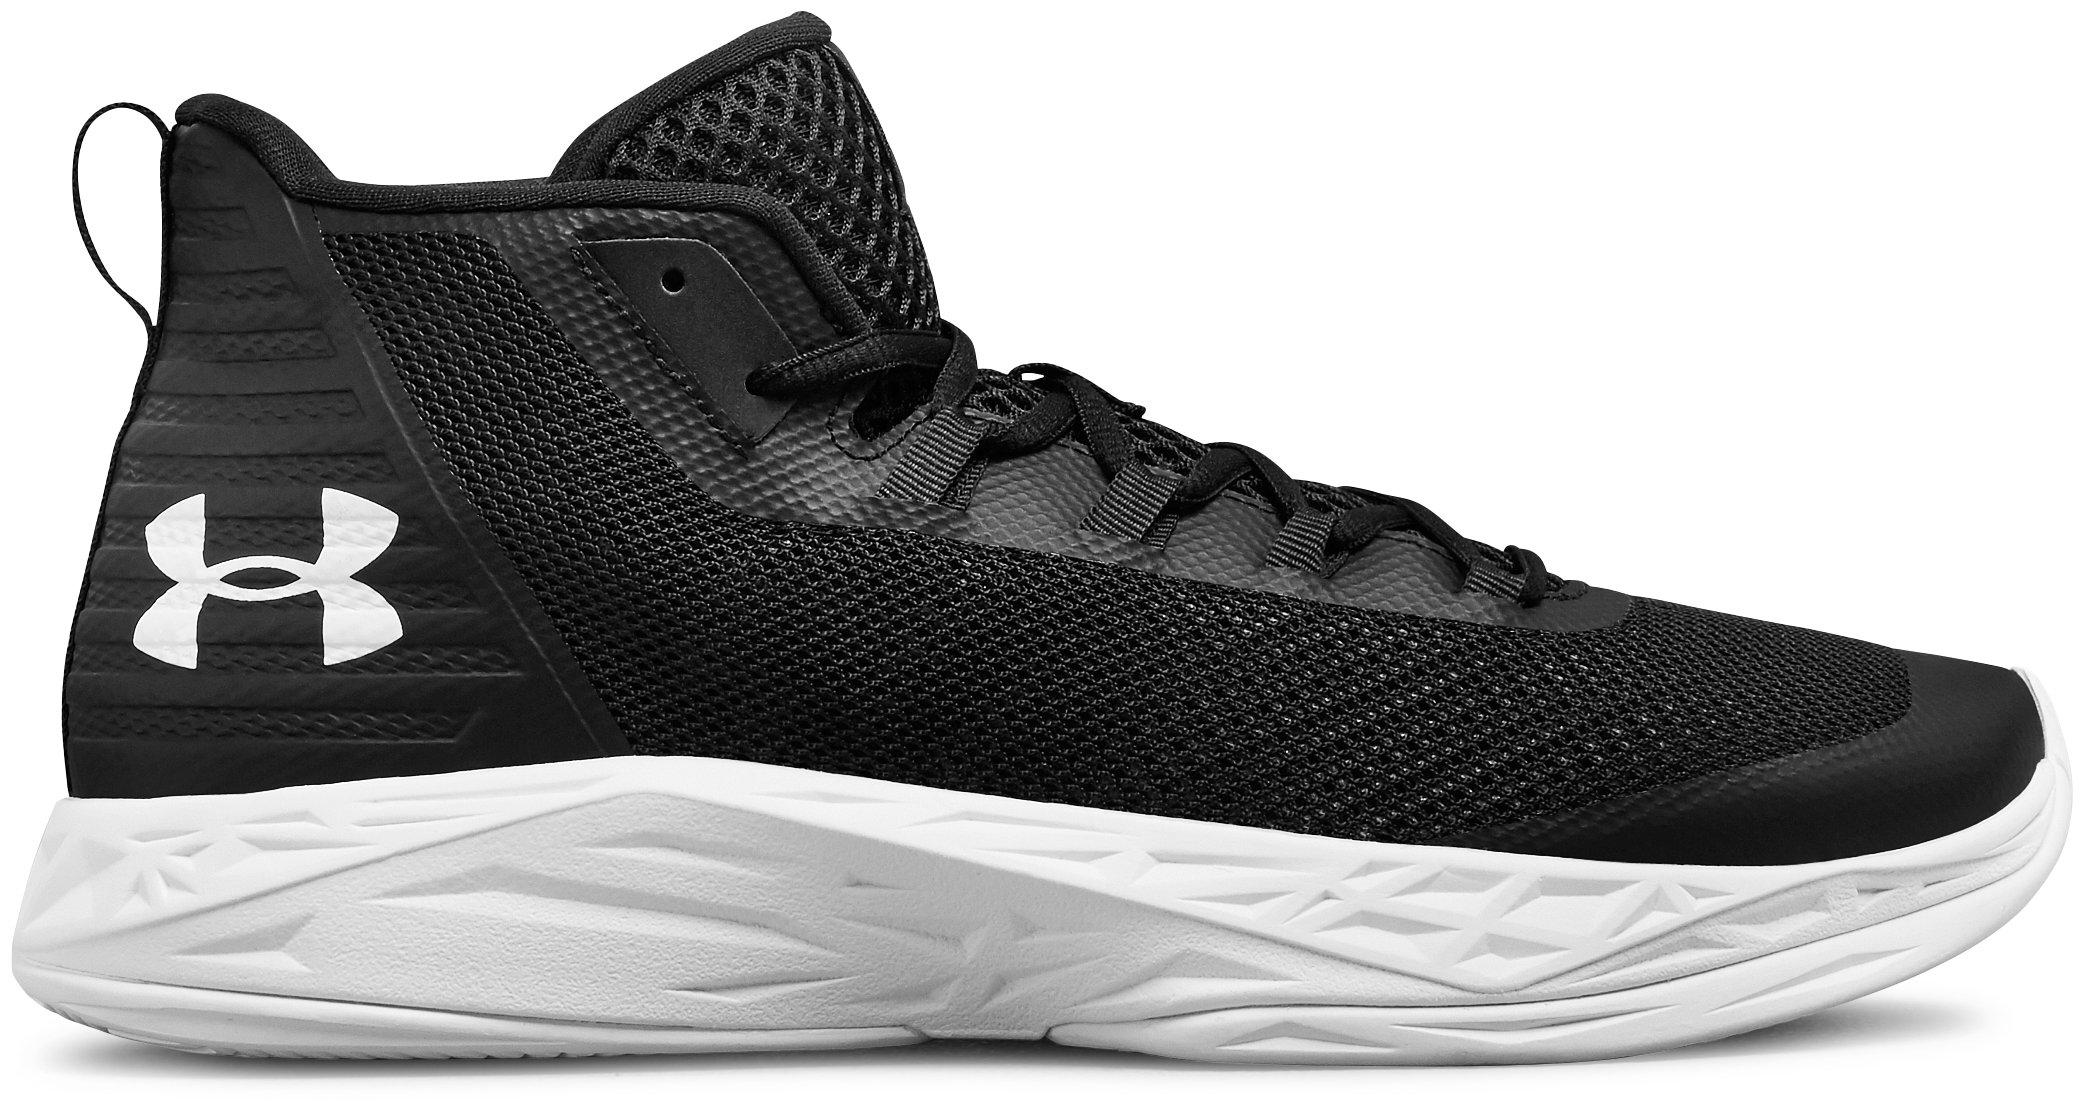 Sepatu Bola Basket UA Jet Mid untuk Pria, 360 degree view